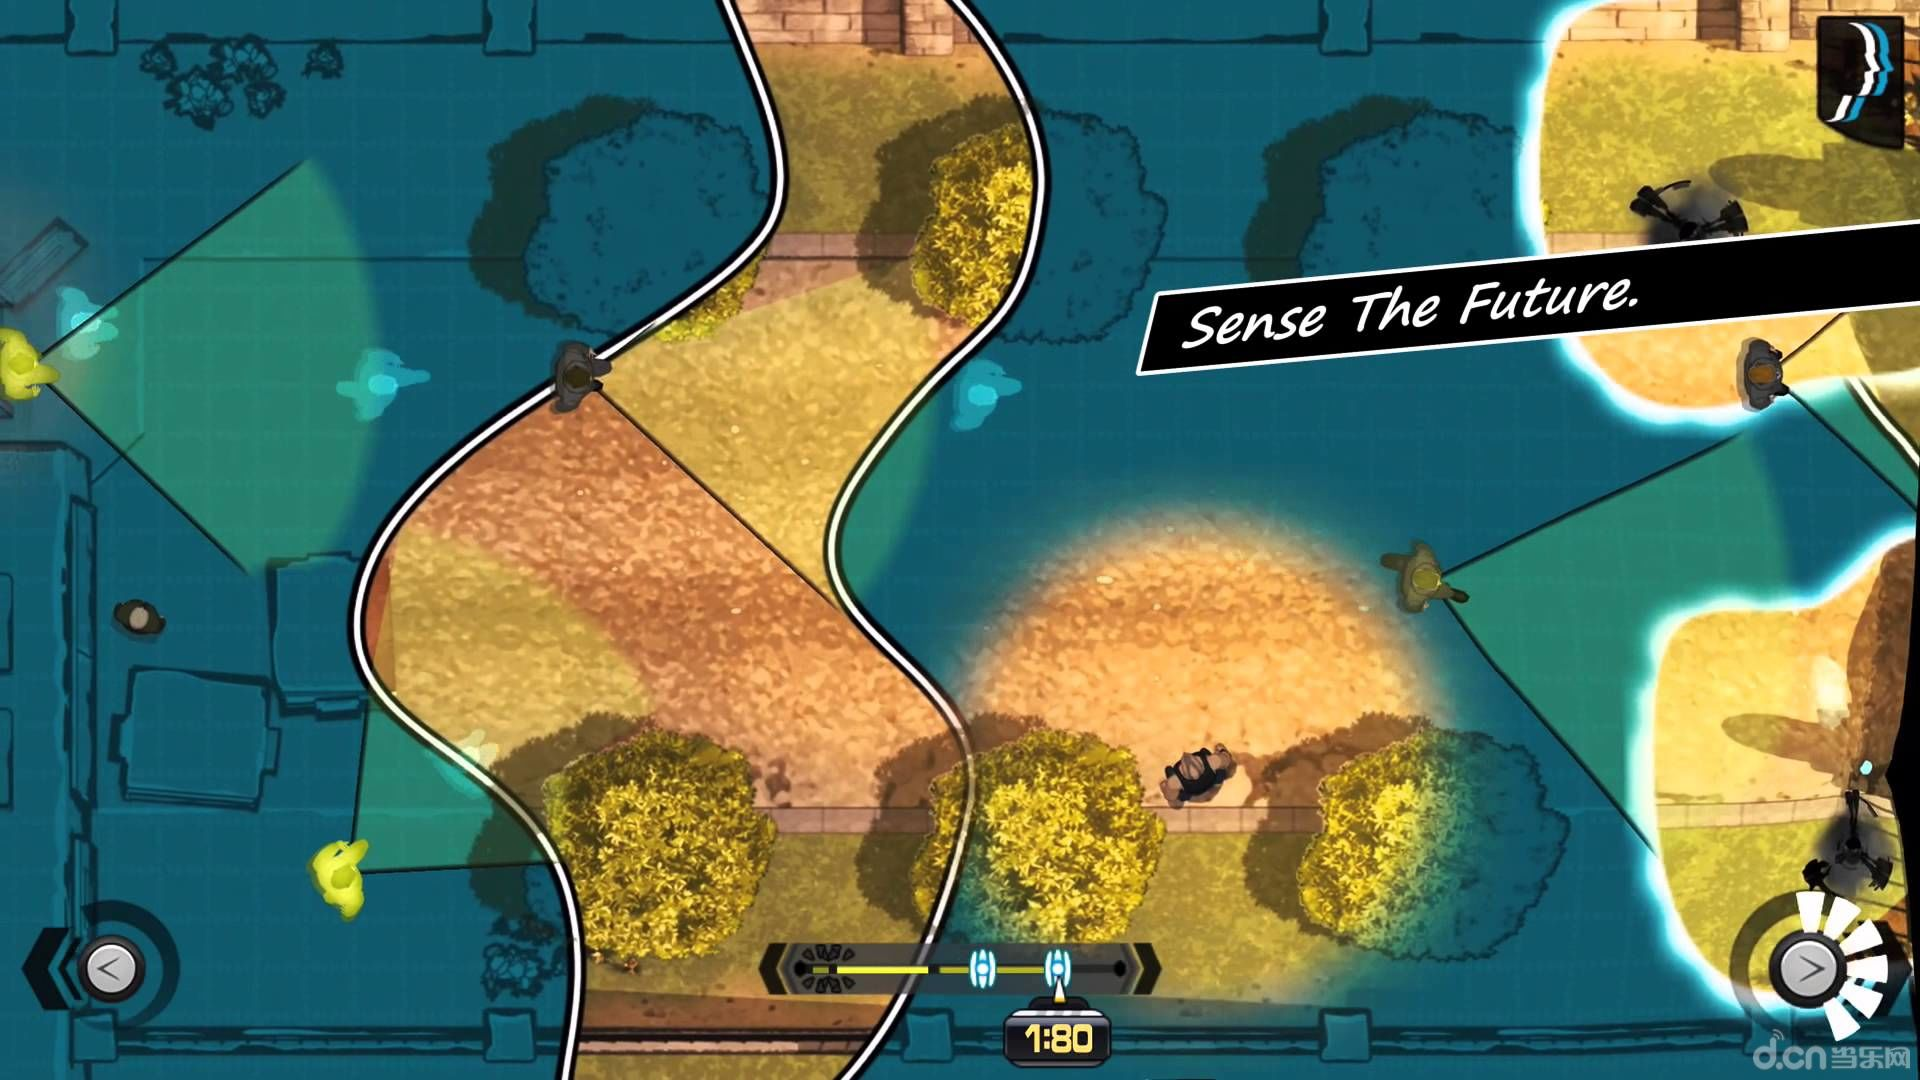 rpg游戏未来地图素材